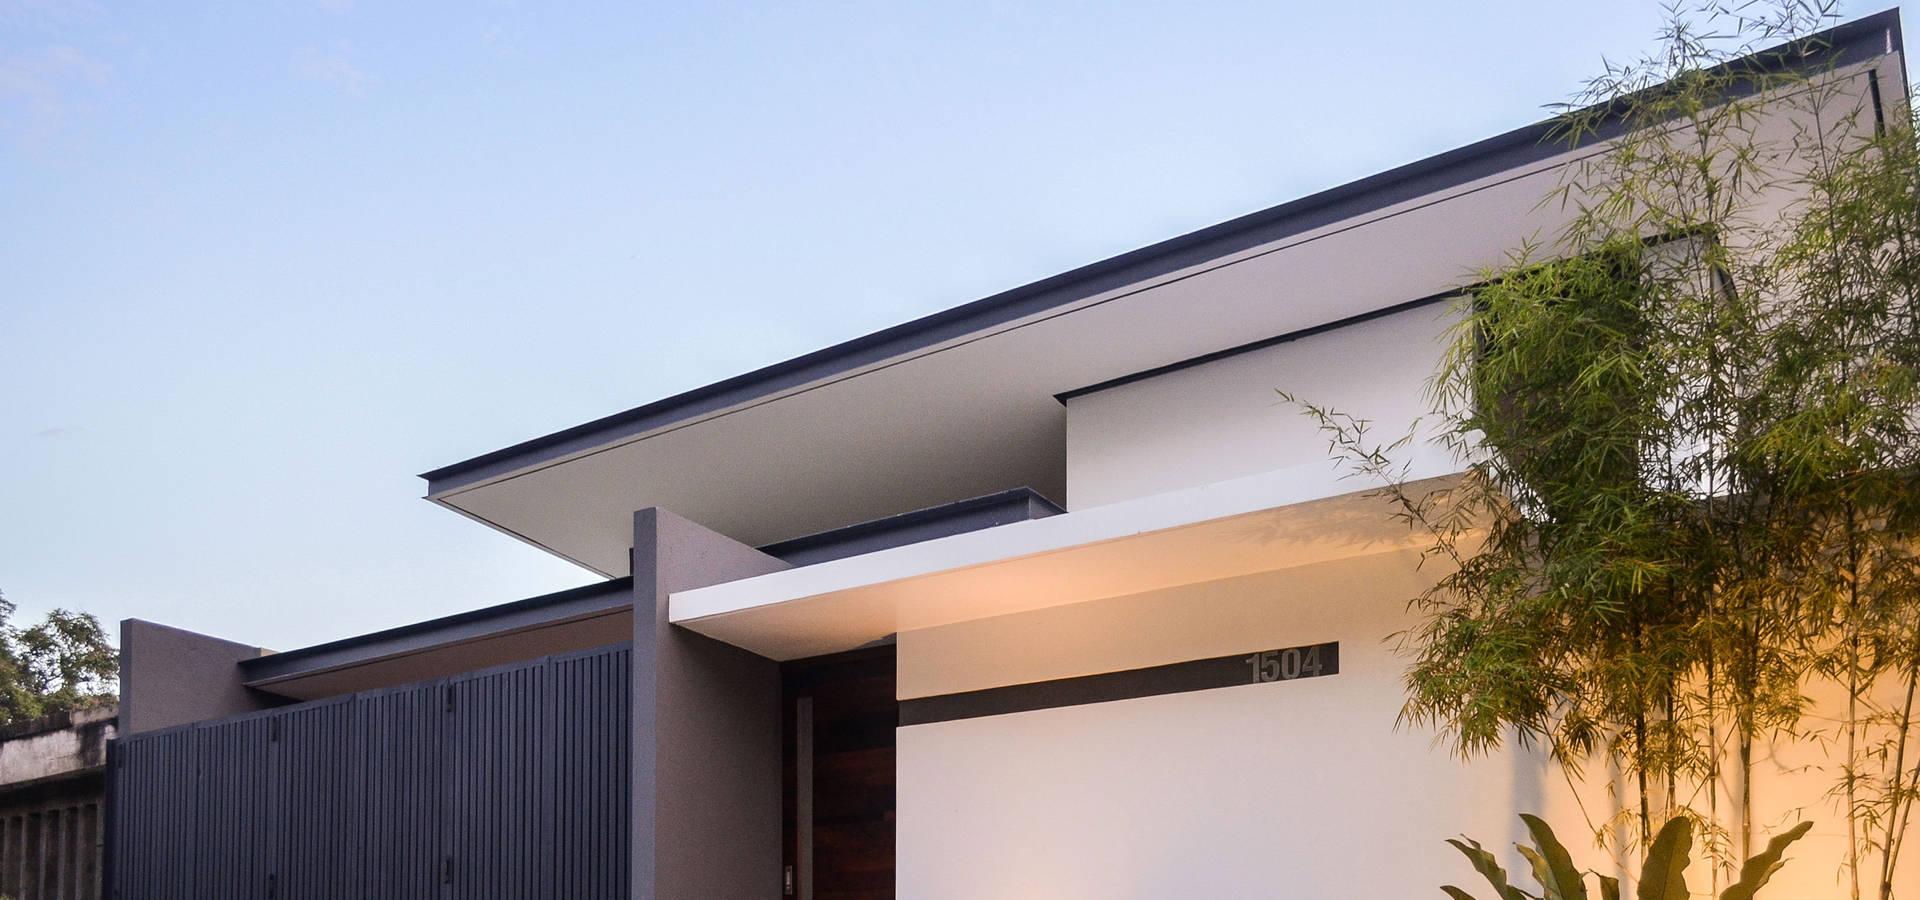 Arciete + Orillo Architects